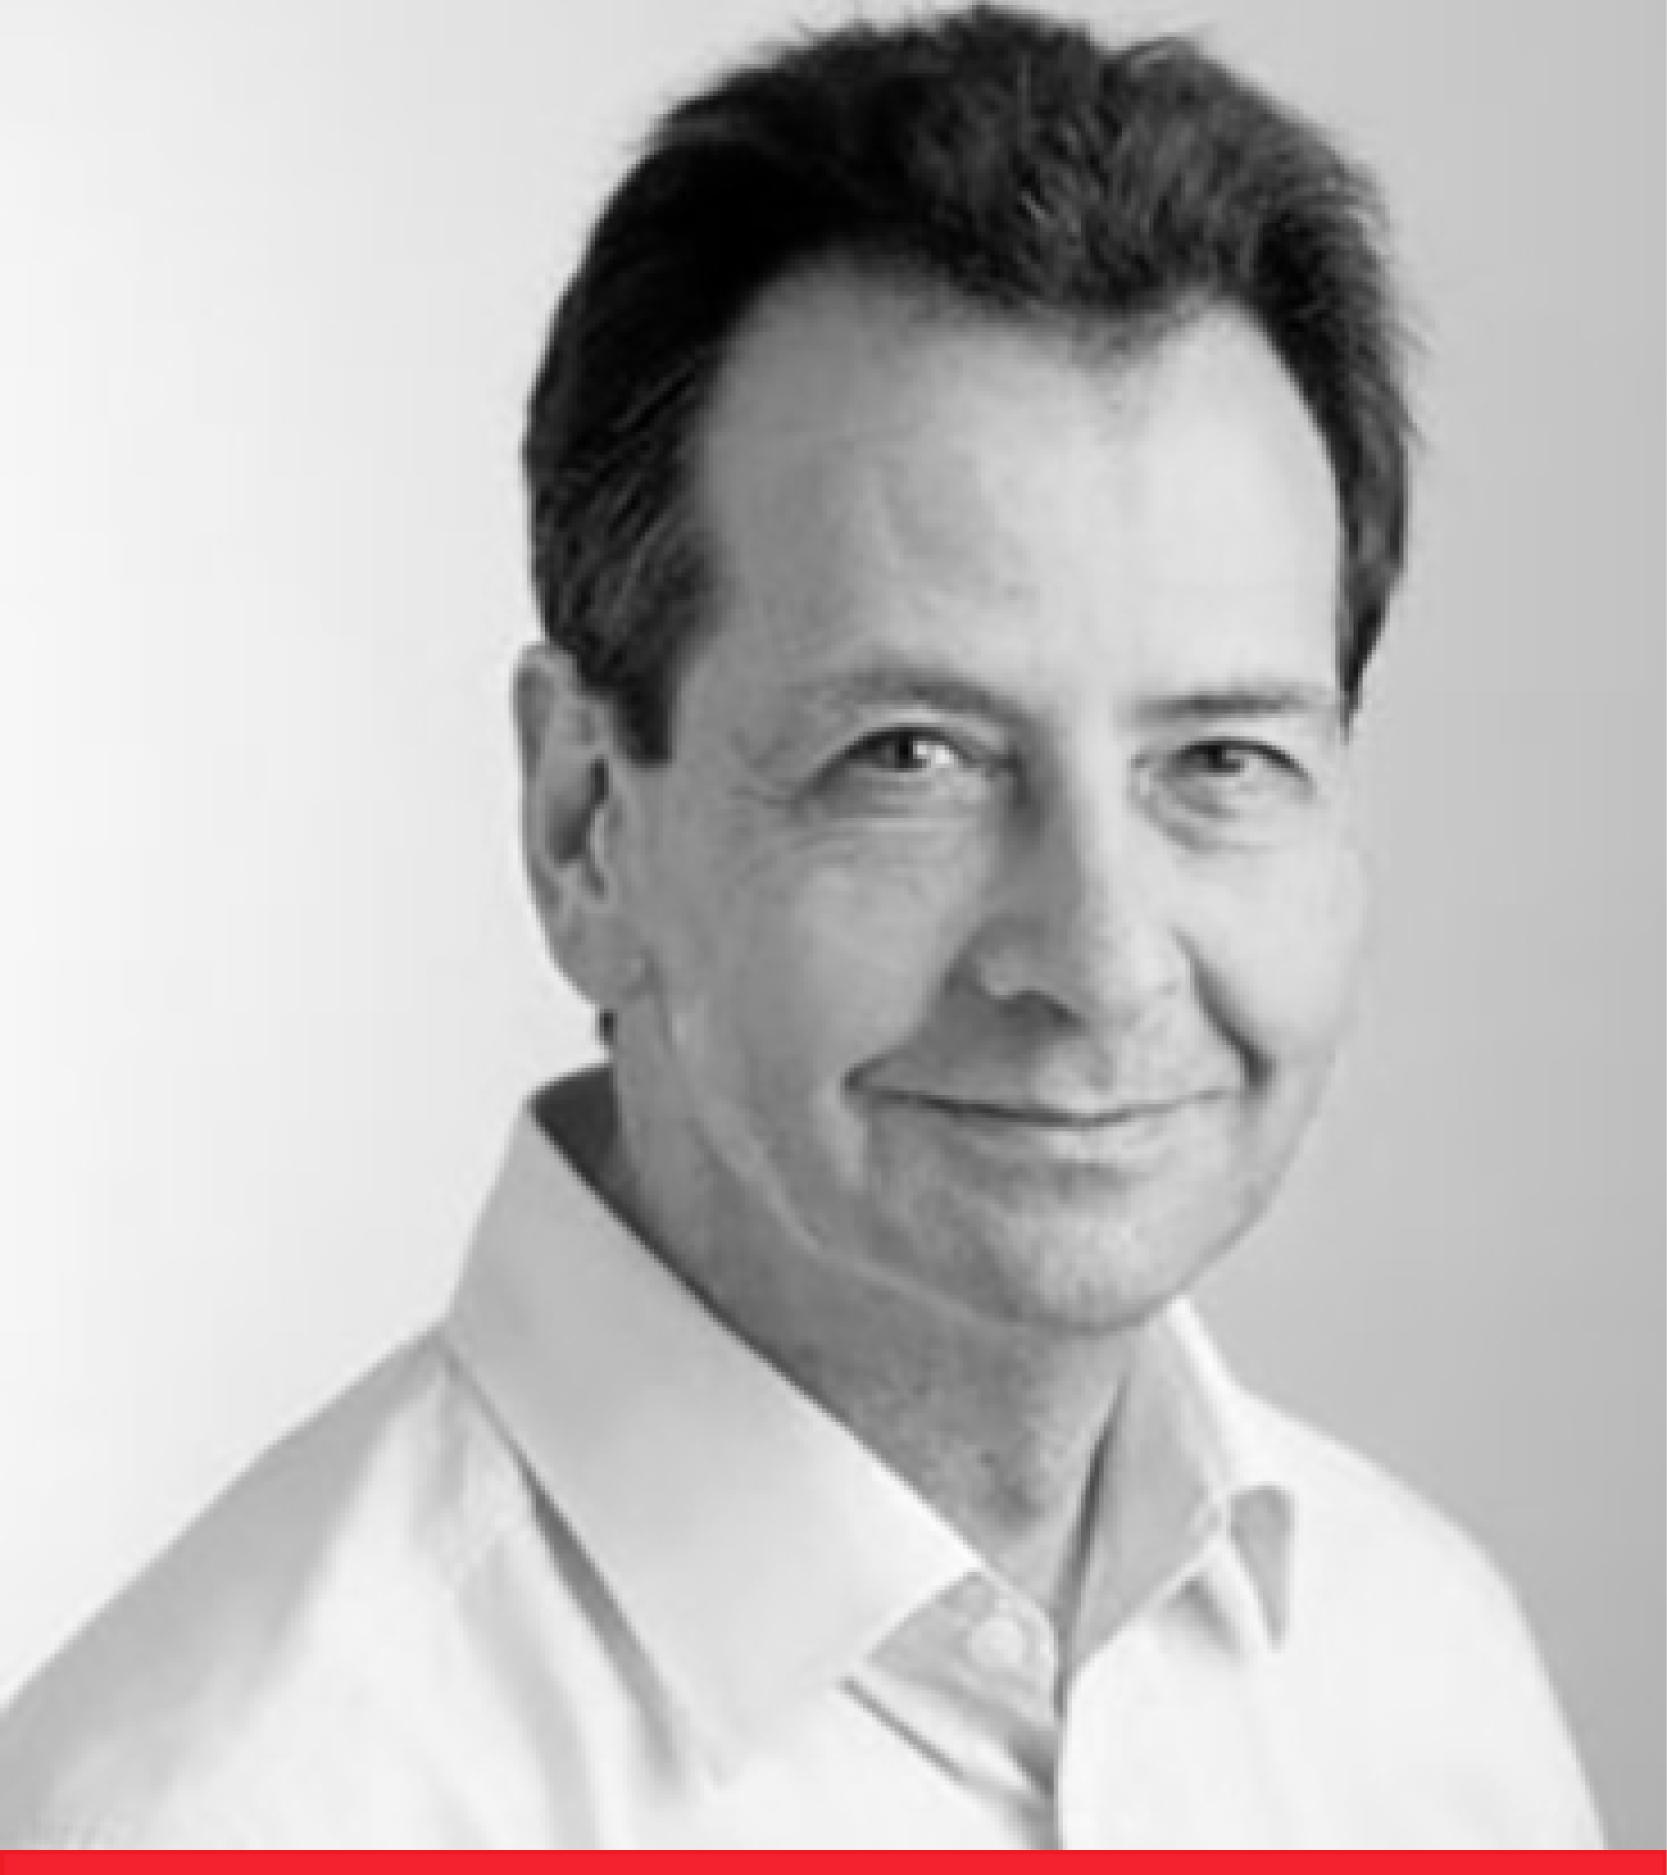 A/Prof Greg Goodman